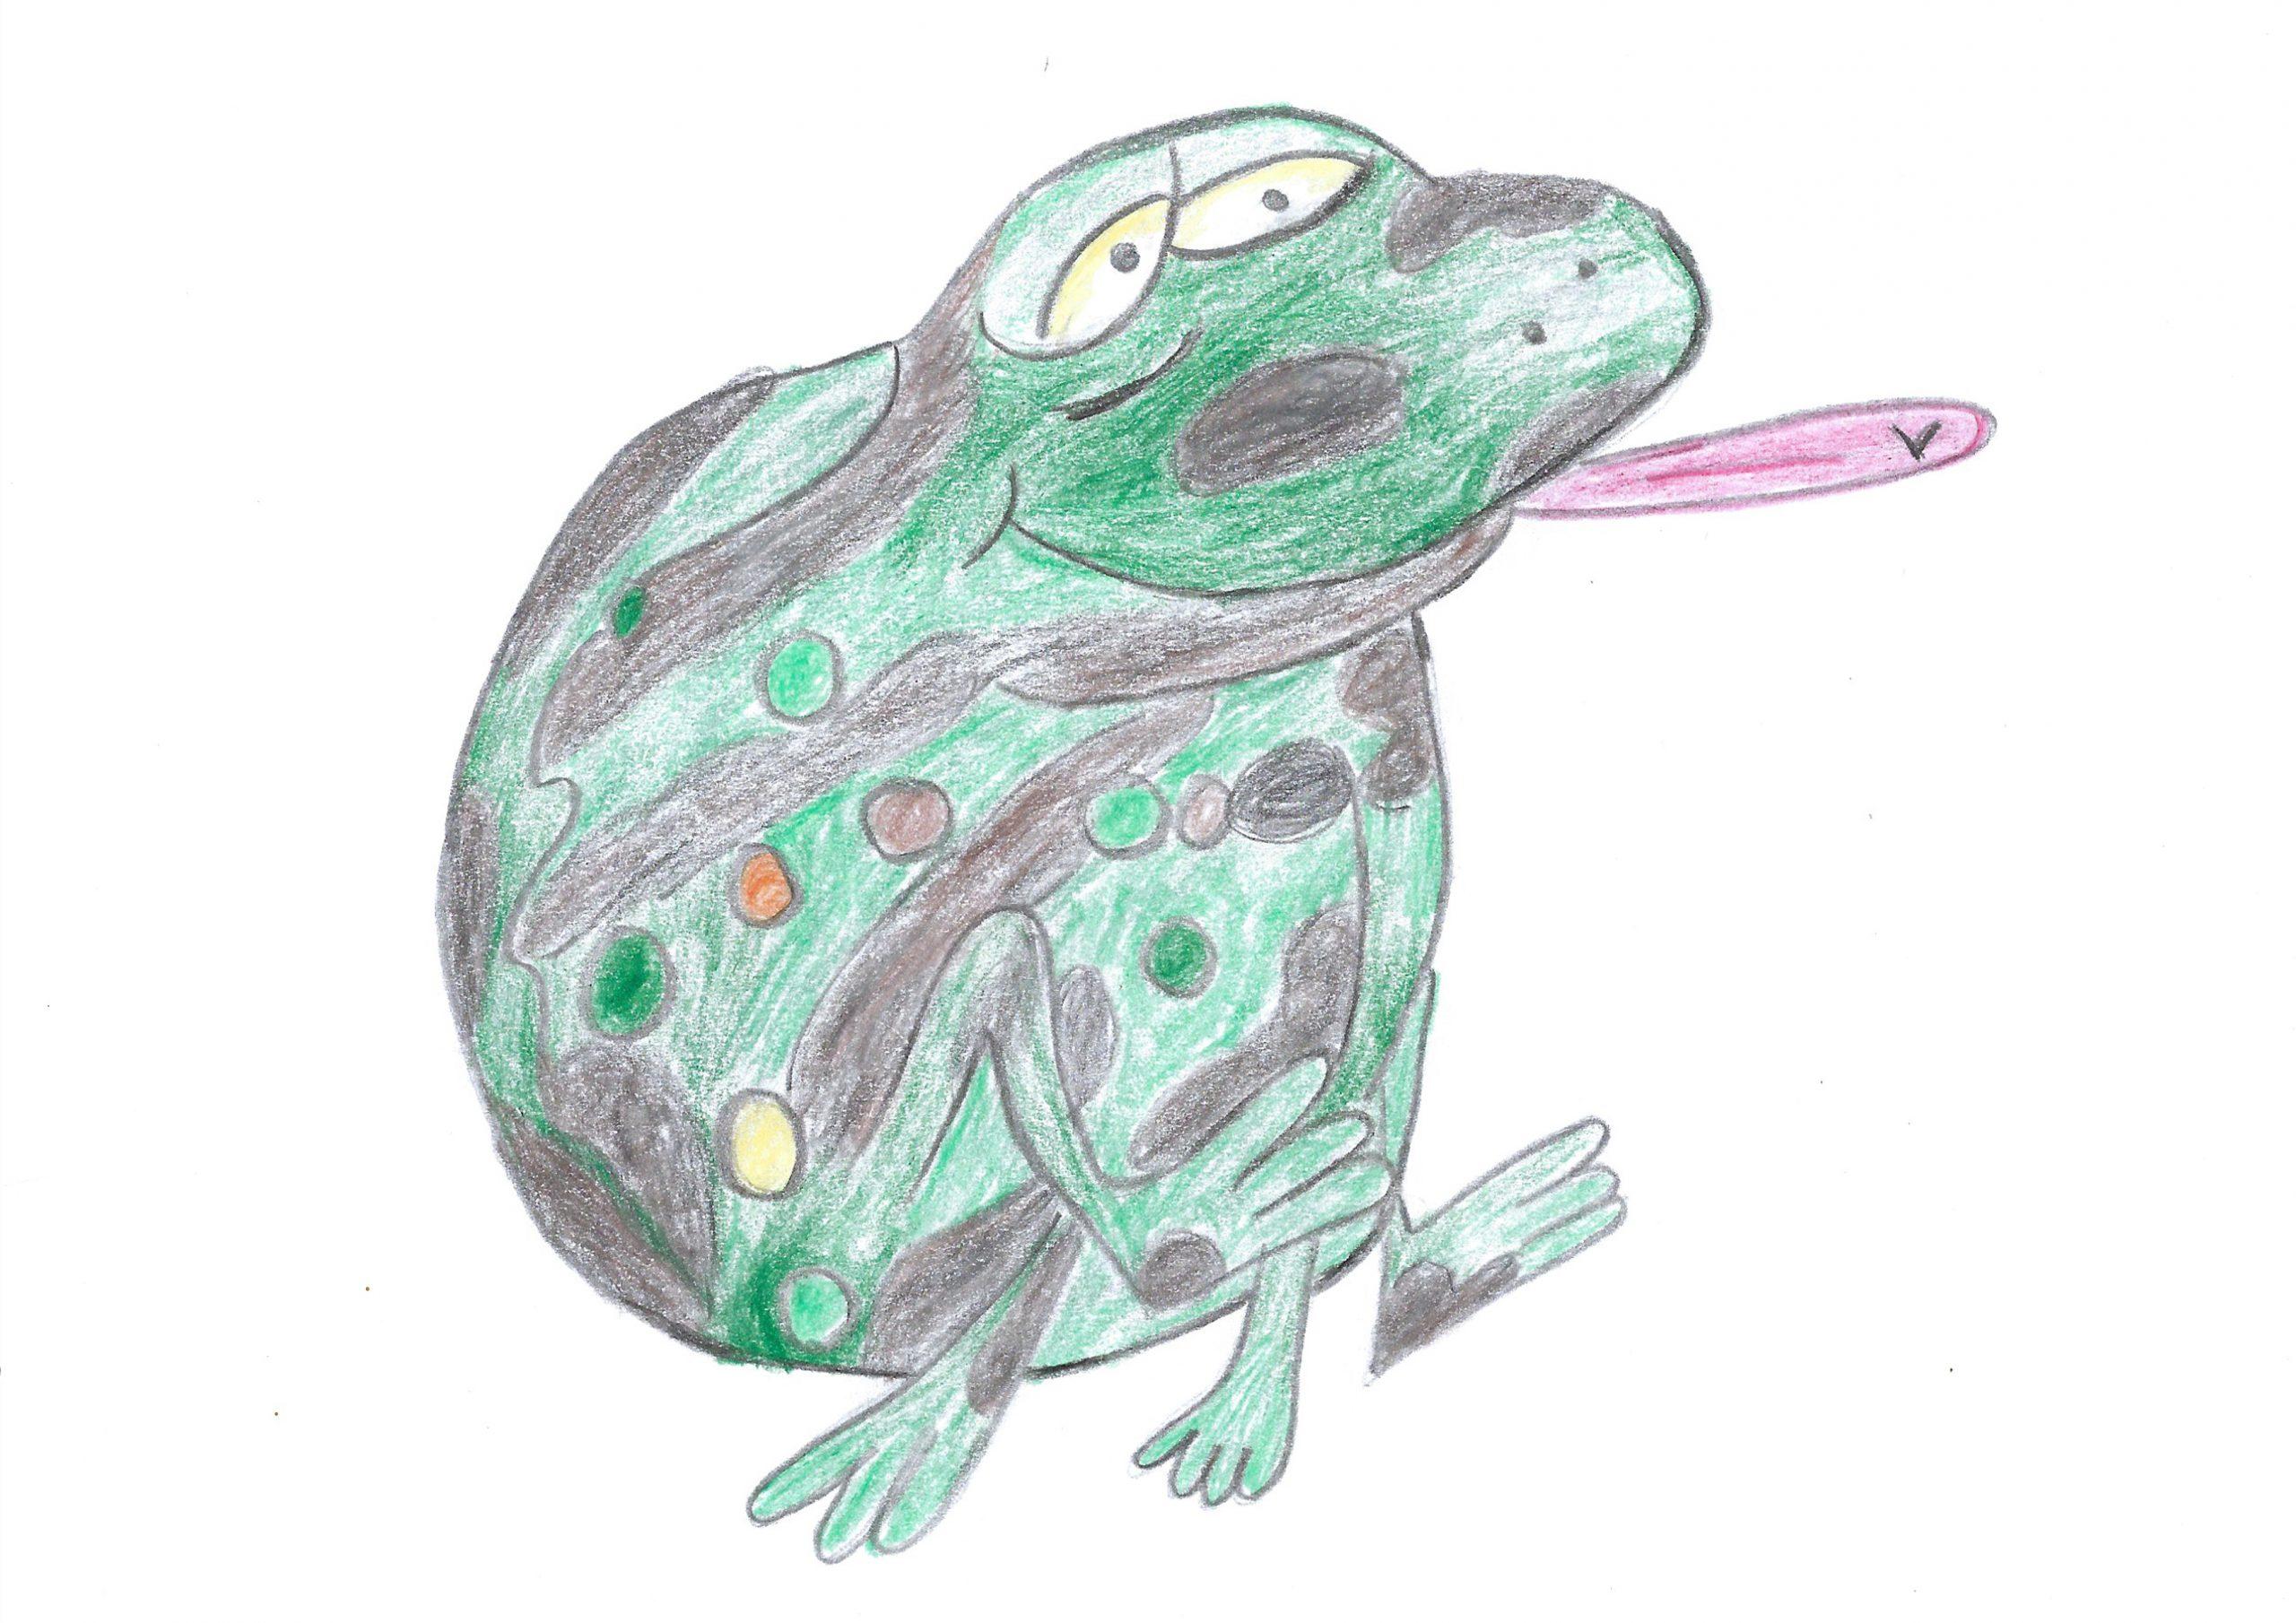 Kururú — The toad